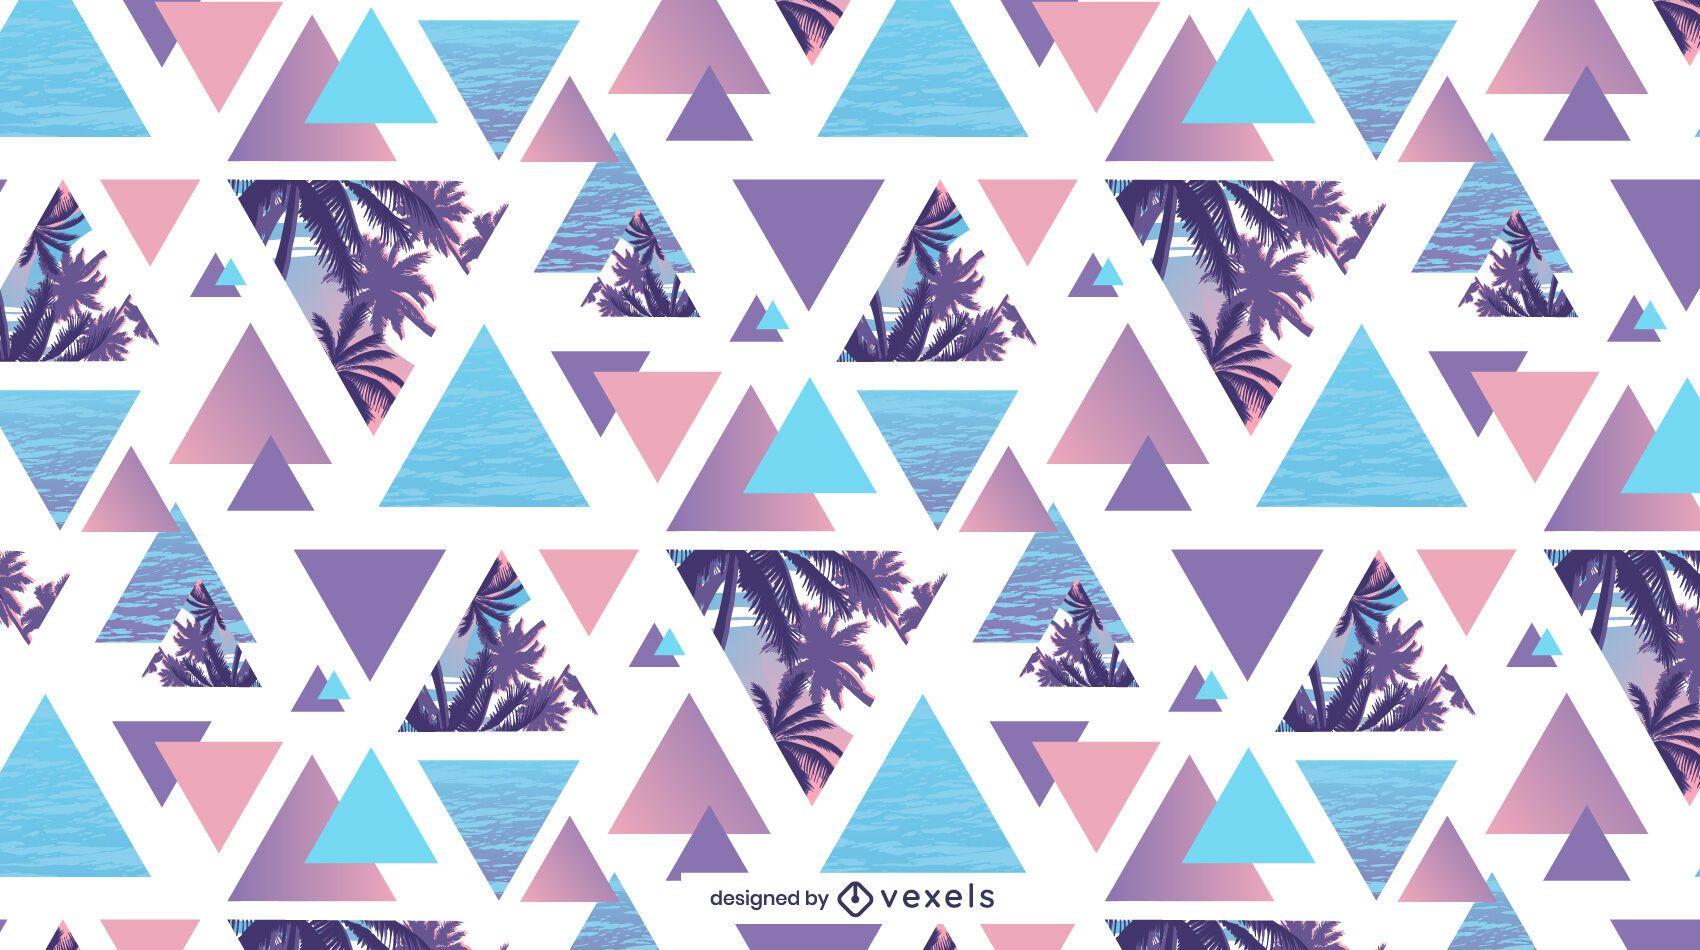 Geometric summer palm tree pattern design